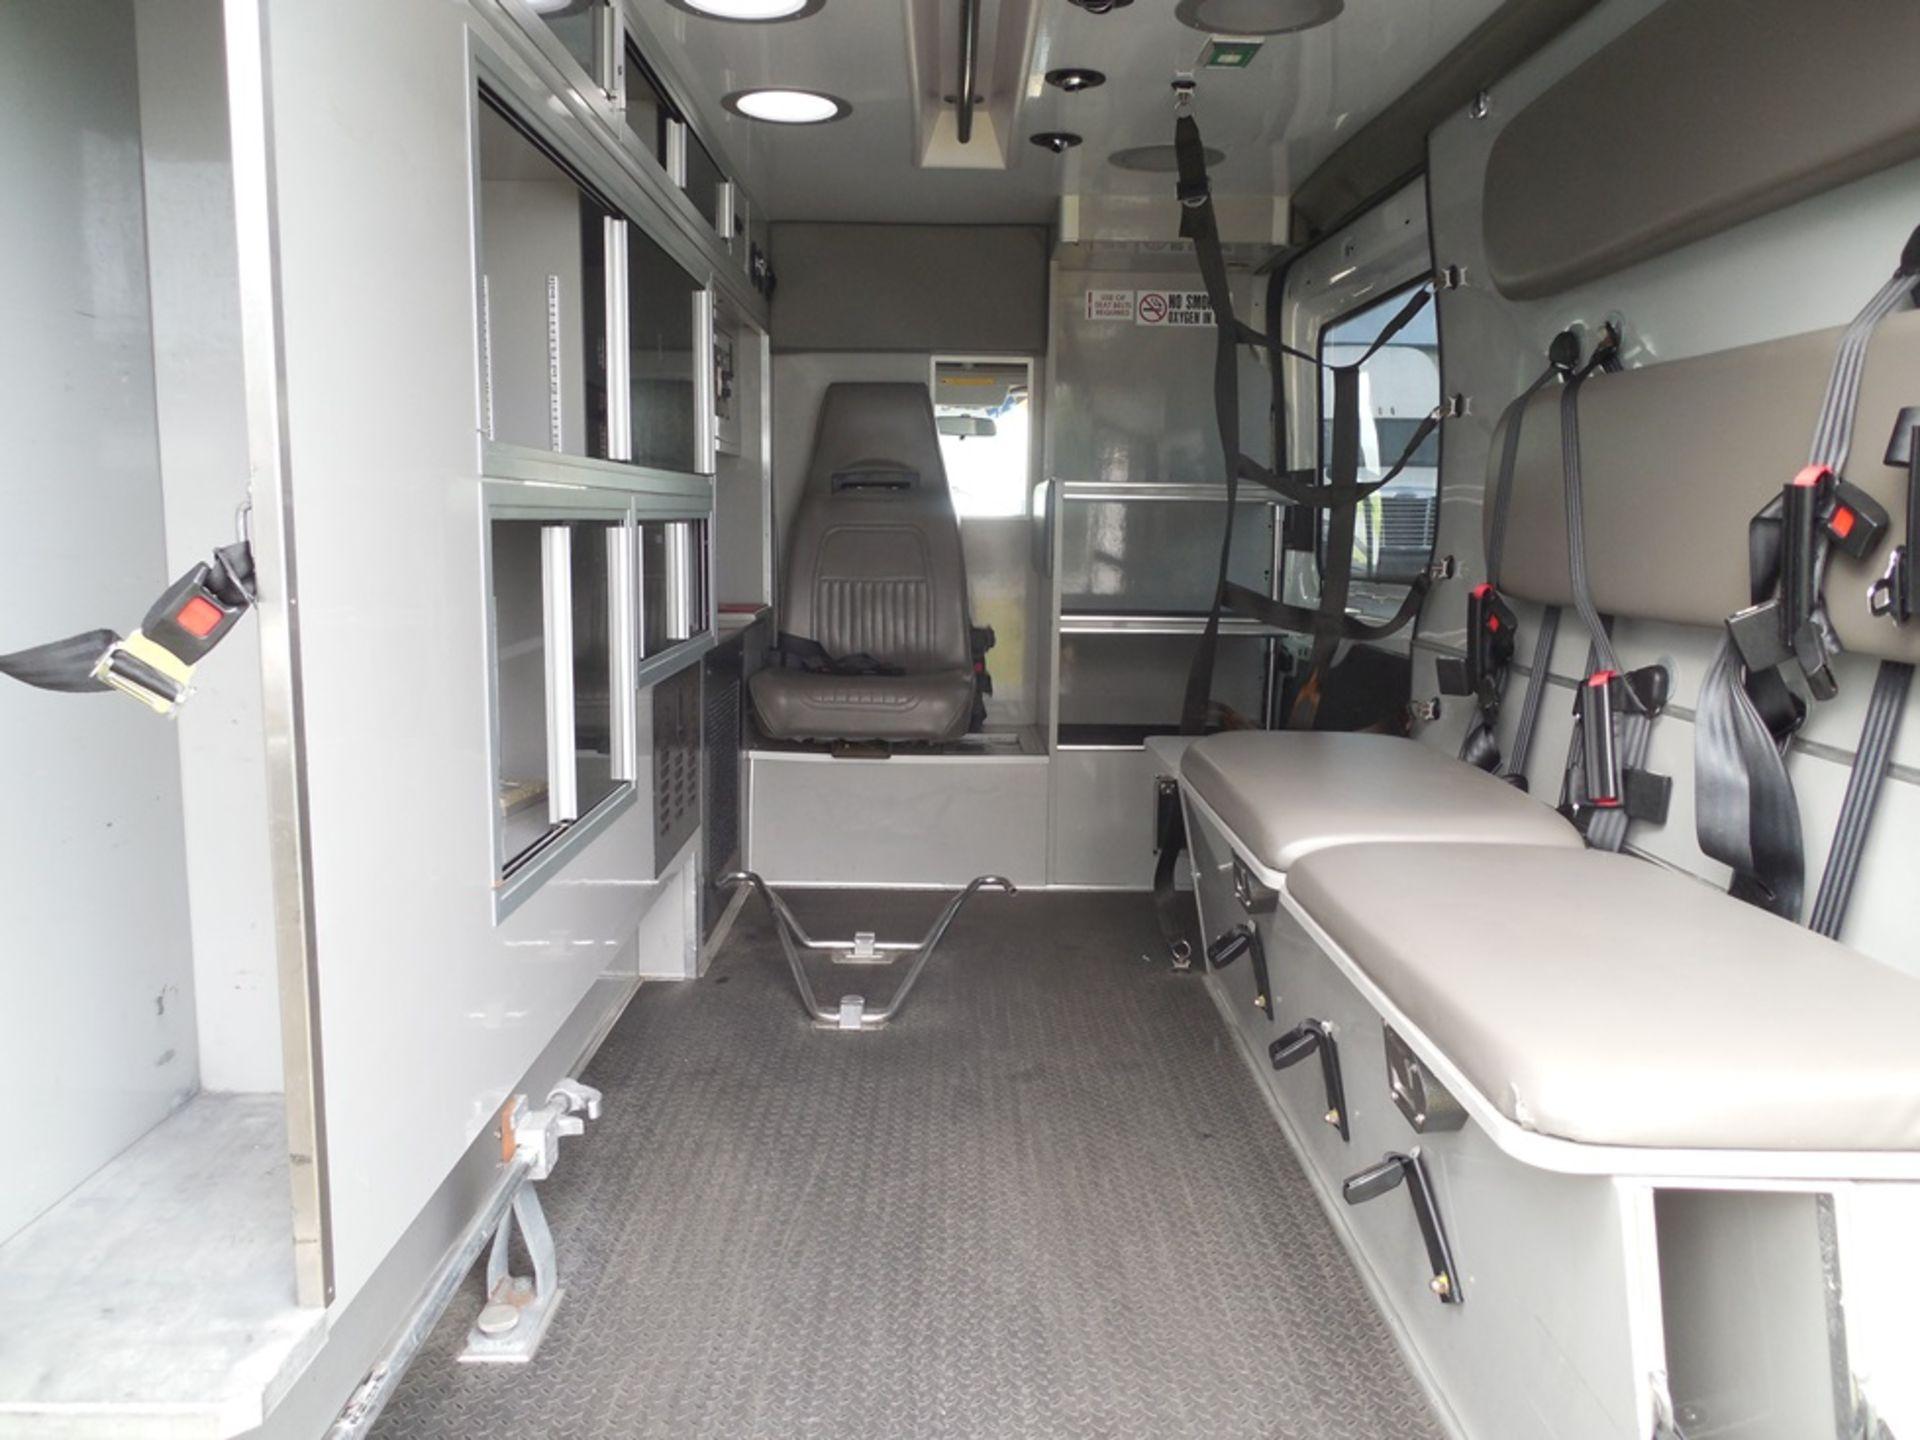 2015 Ford Tansit 250 dsl ambulance 194,312 miles vin# 1FDYR2CV5FKB33096 - Image 6 of 6